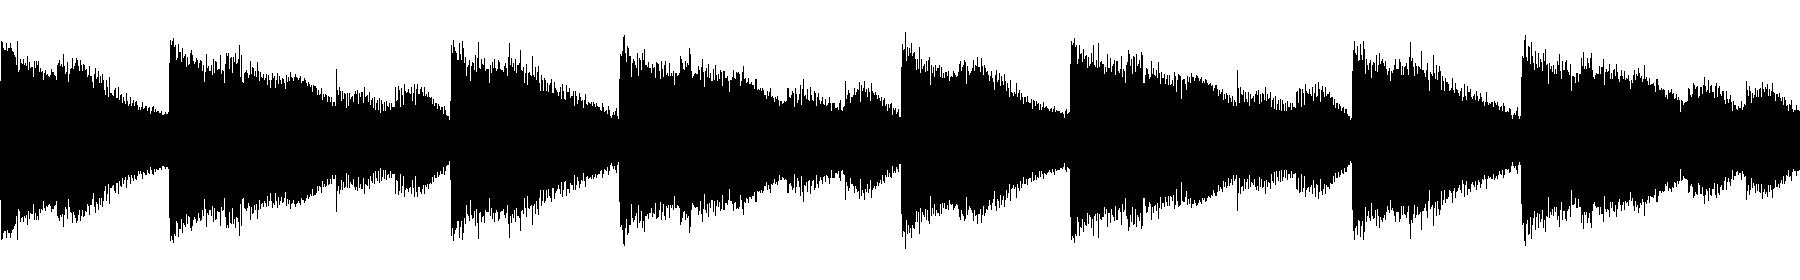 g 145 bpm